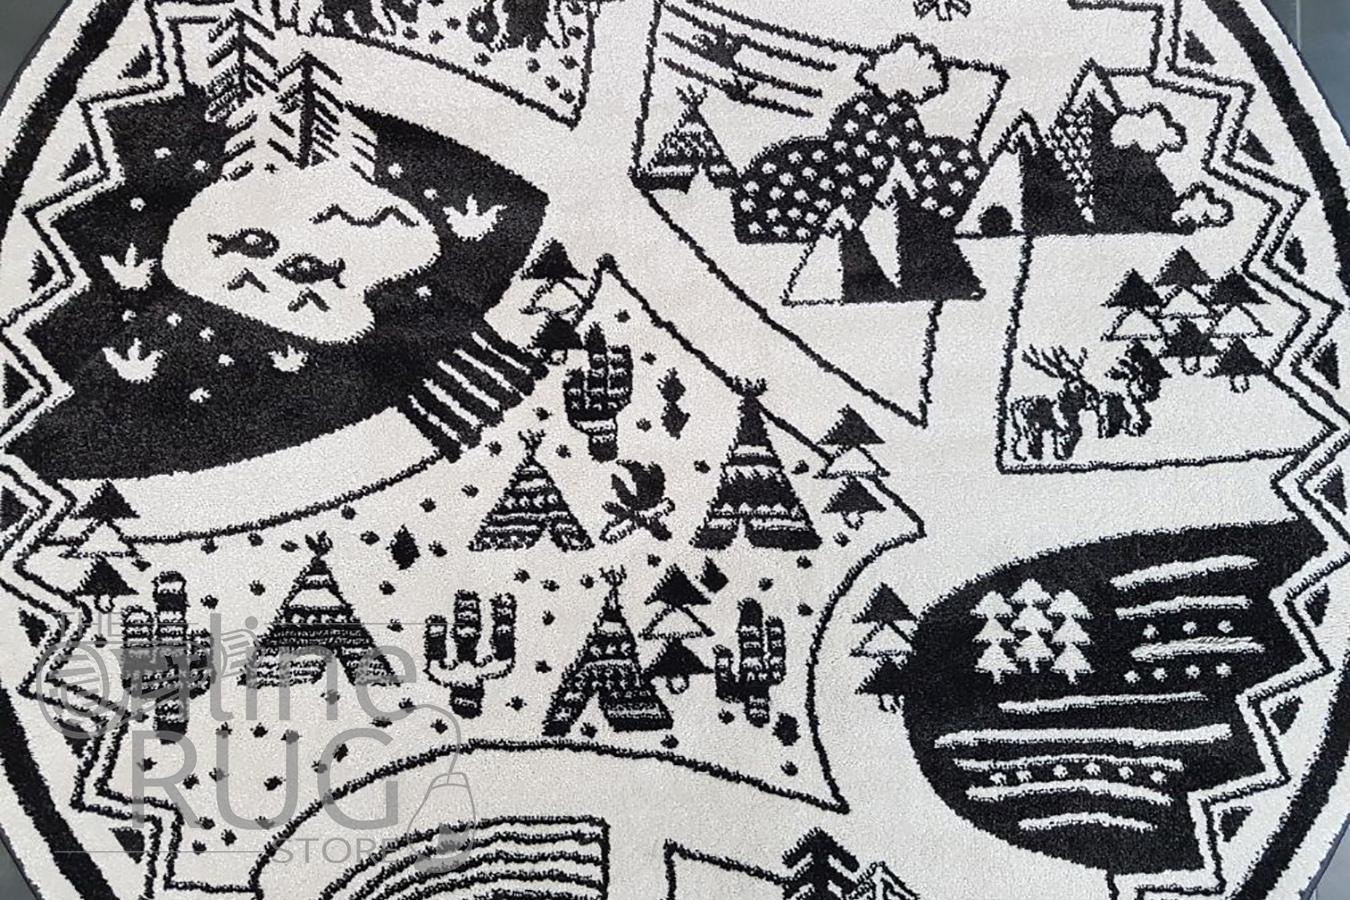 Bambino Black White Tribal Camp Pattern Round Rug